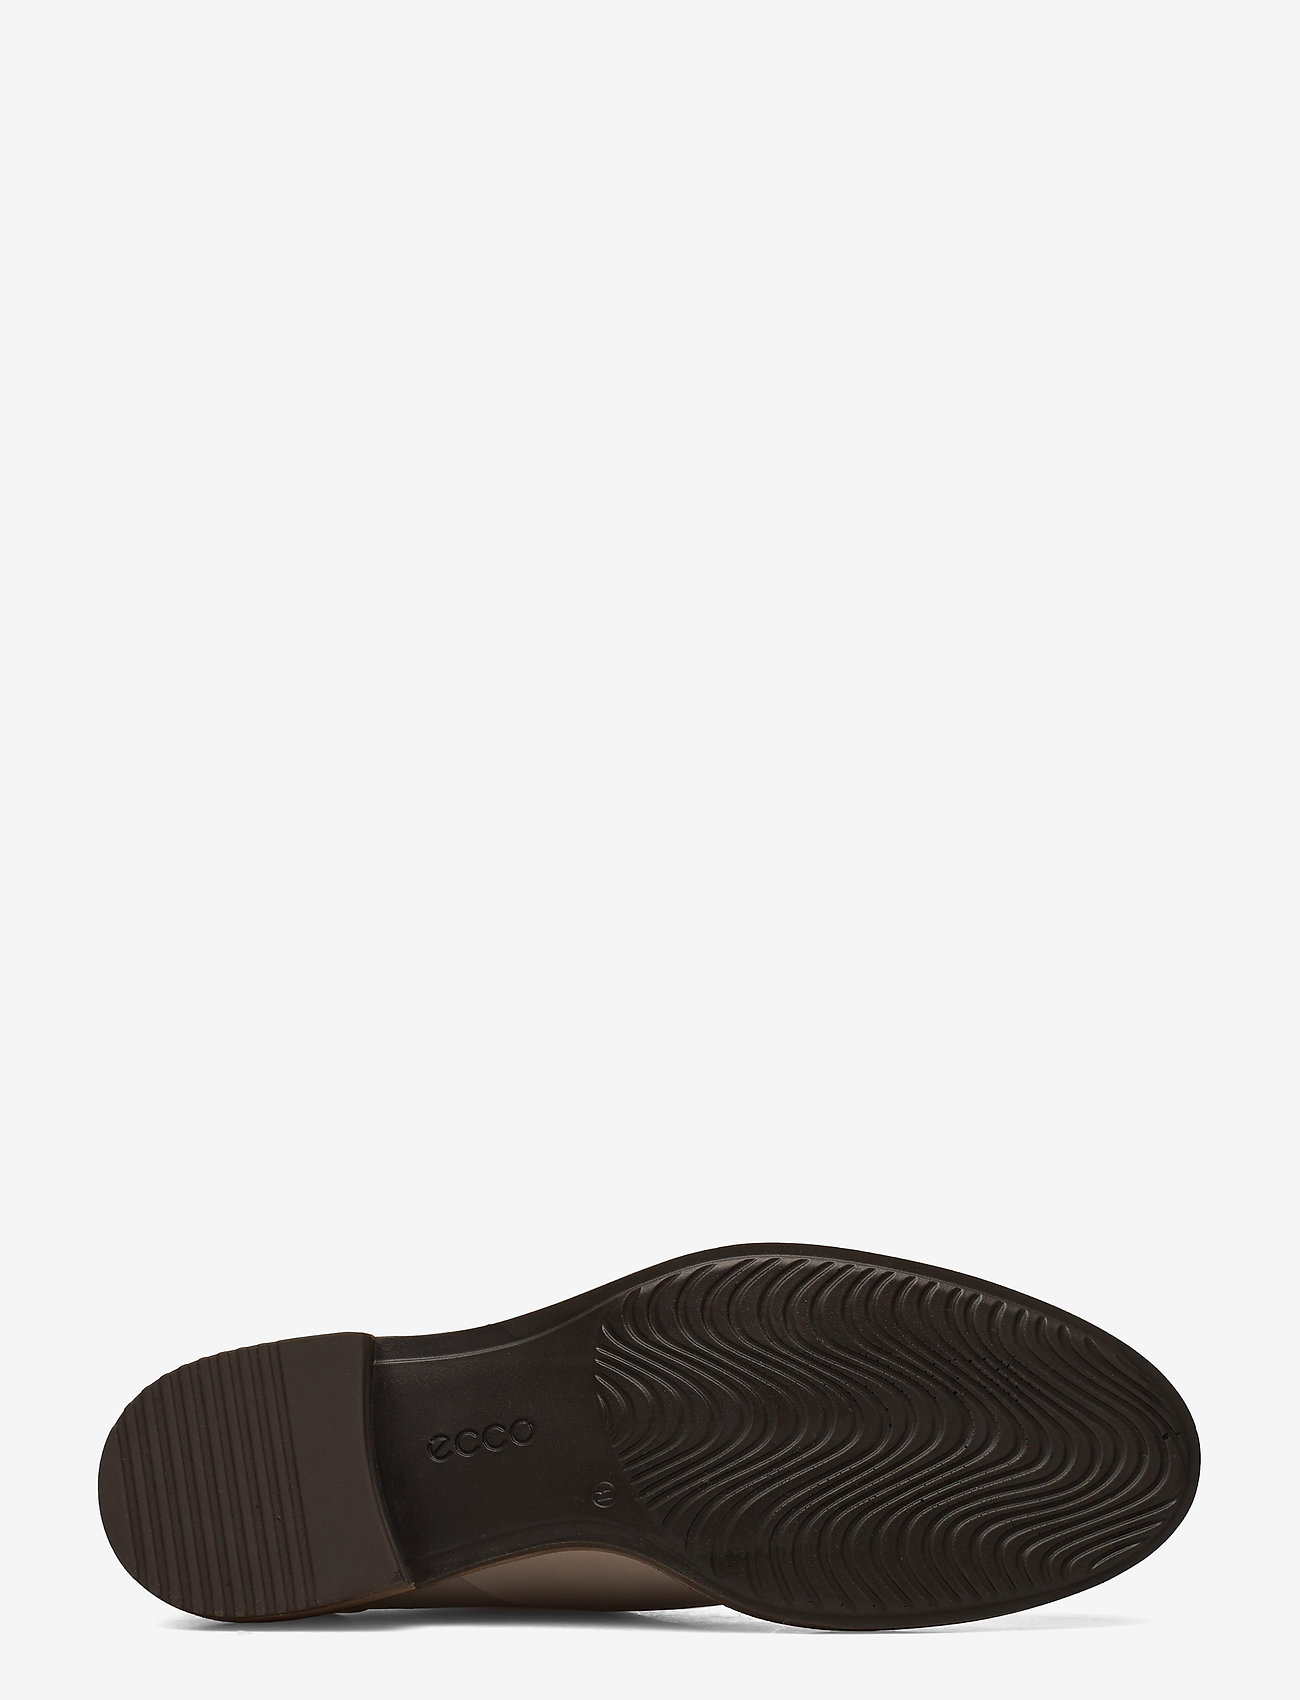 ECCO  SARTORELLE 25 TAILORED - Flache Schuhe